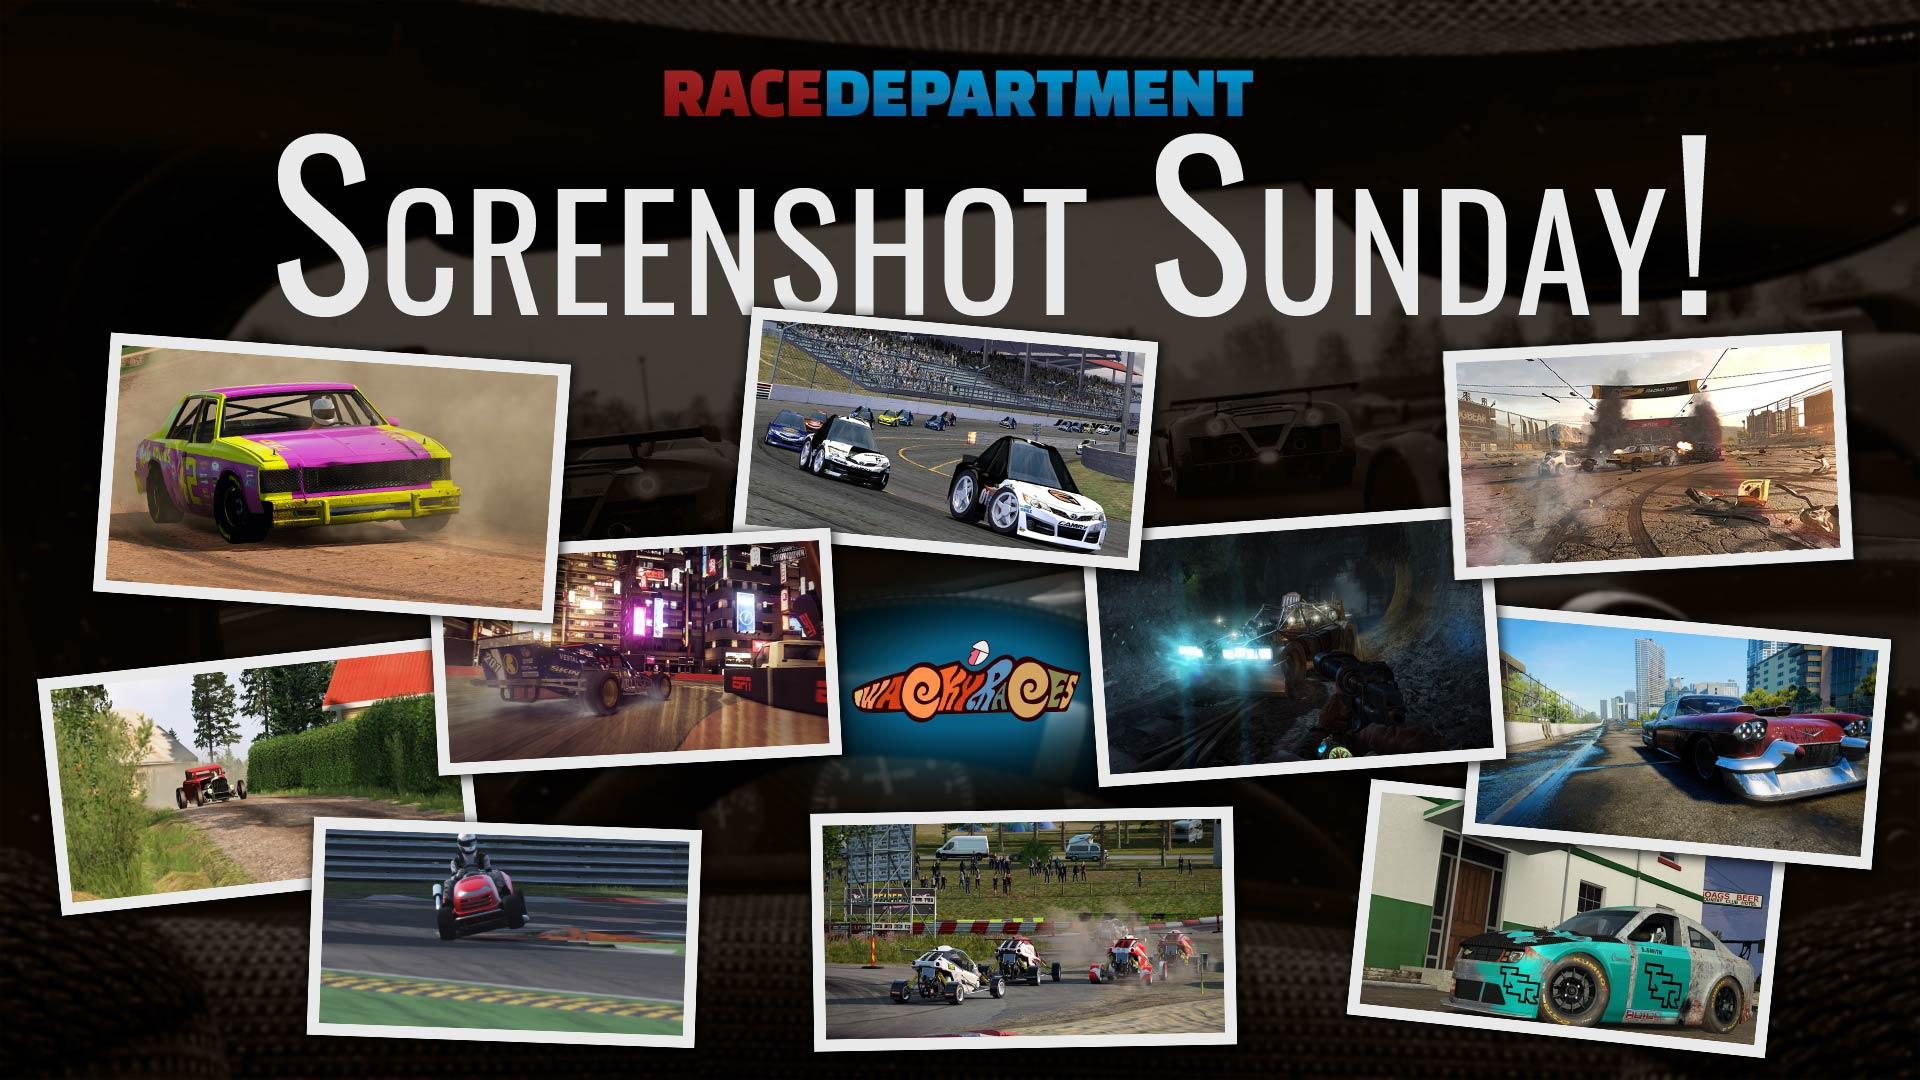 Screenshot Sunday - Wacky Races.jpg